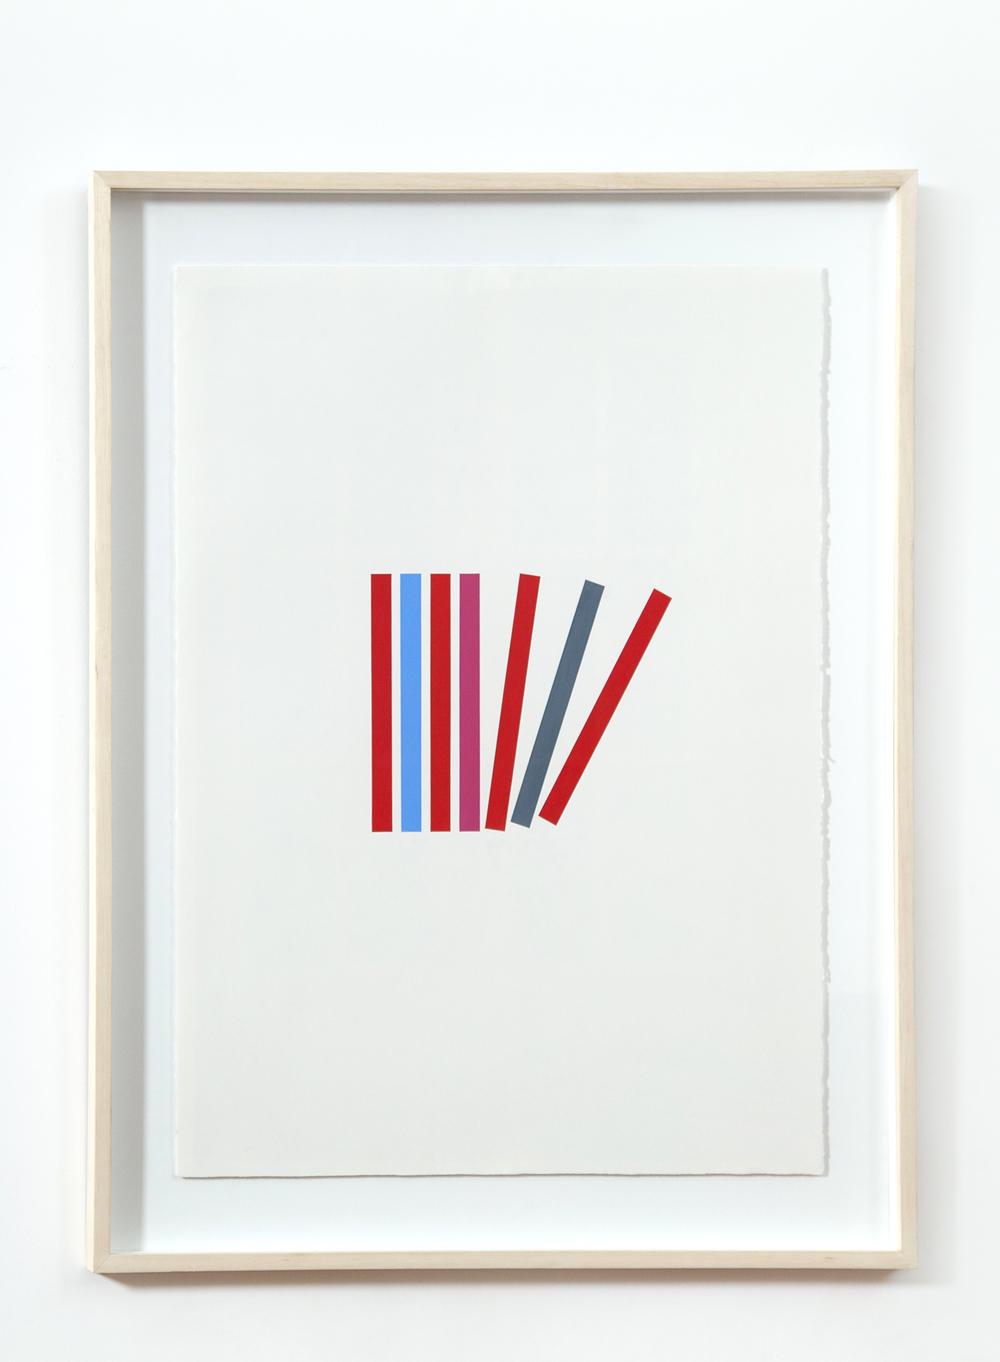 Oil pastel on paper / 96cm x 66cm